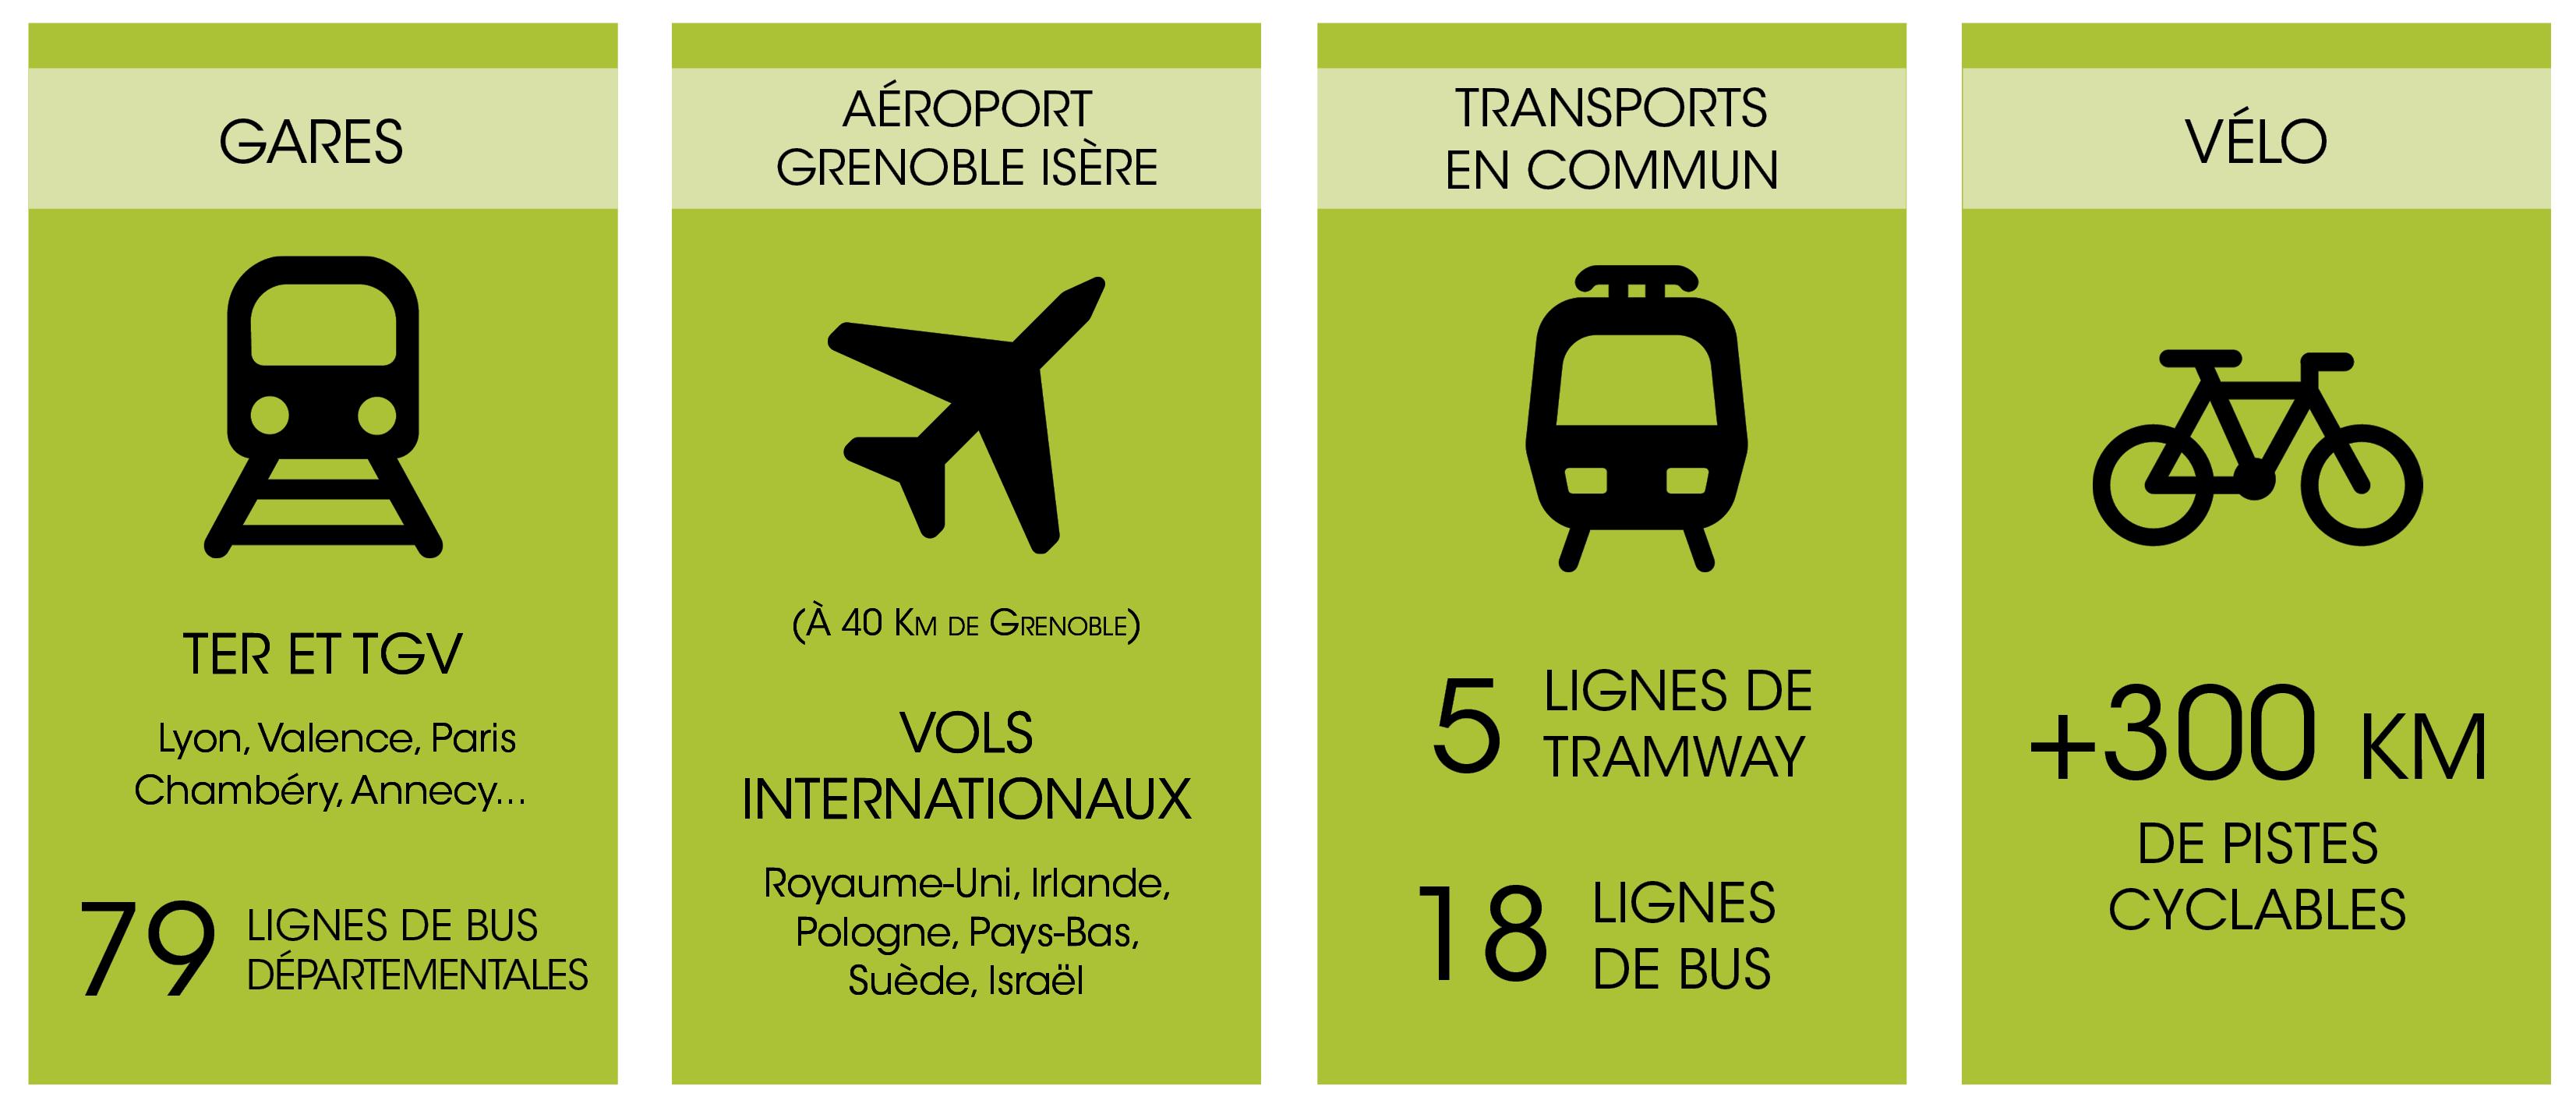 Etudier a Grenoble: ville innovante et etudiante - CEA Tech